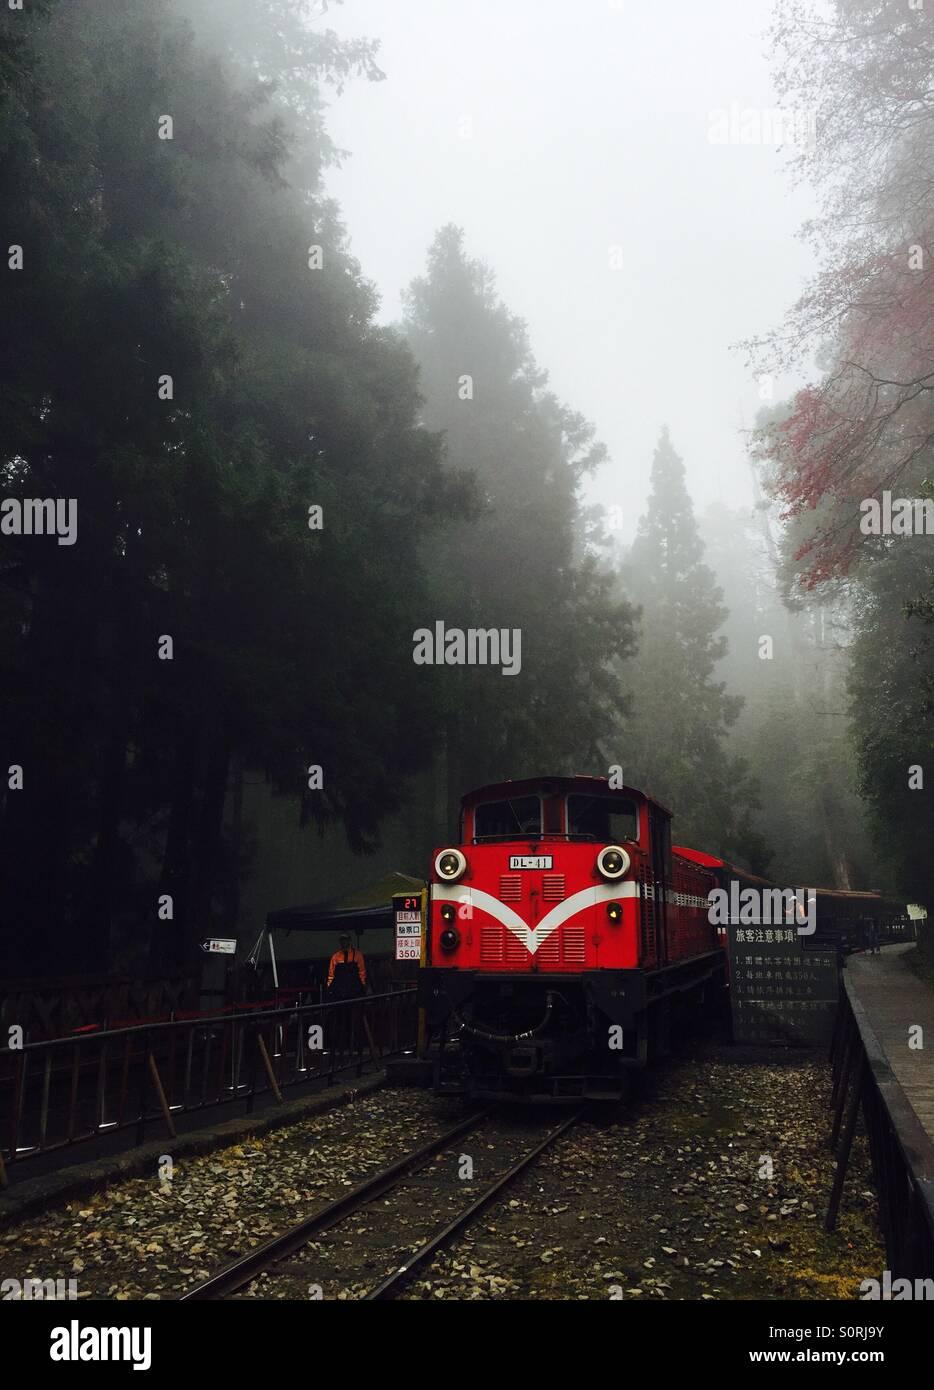 Old train running through the mist - Stock Image